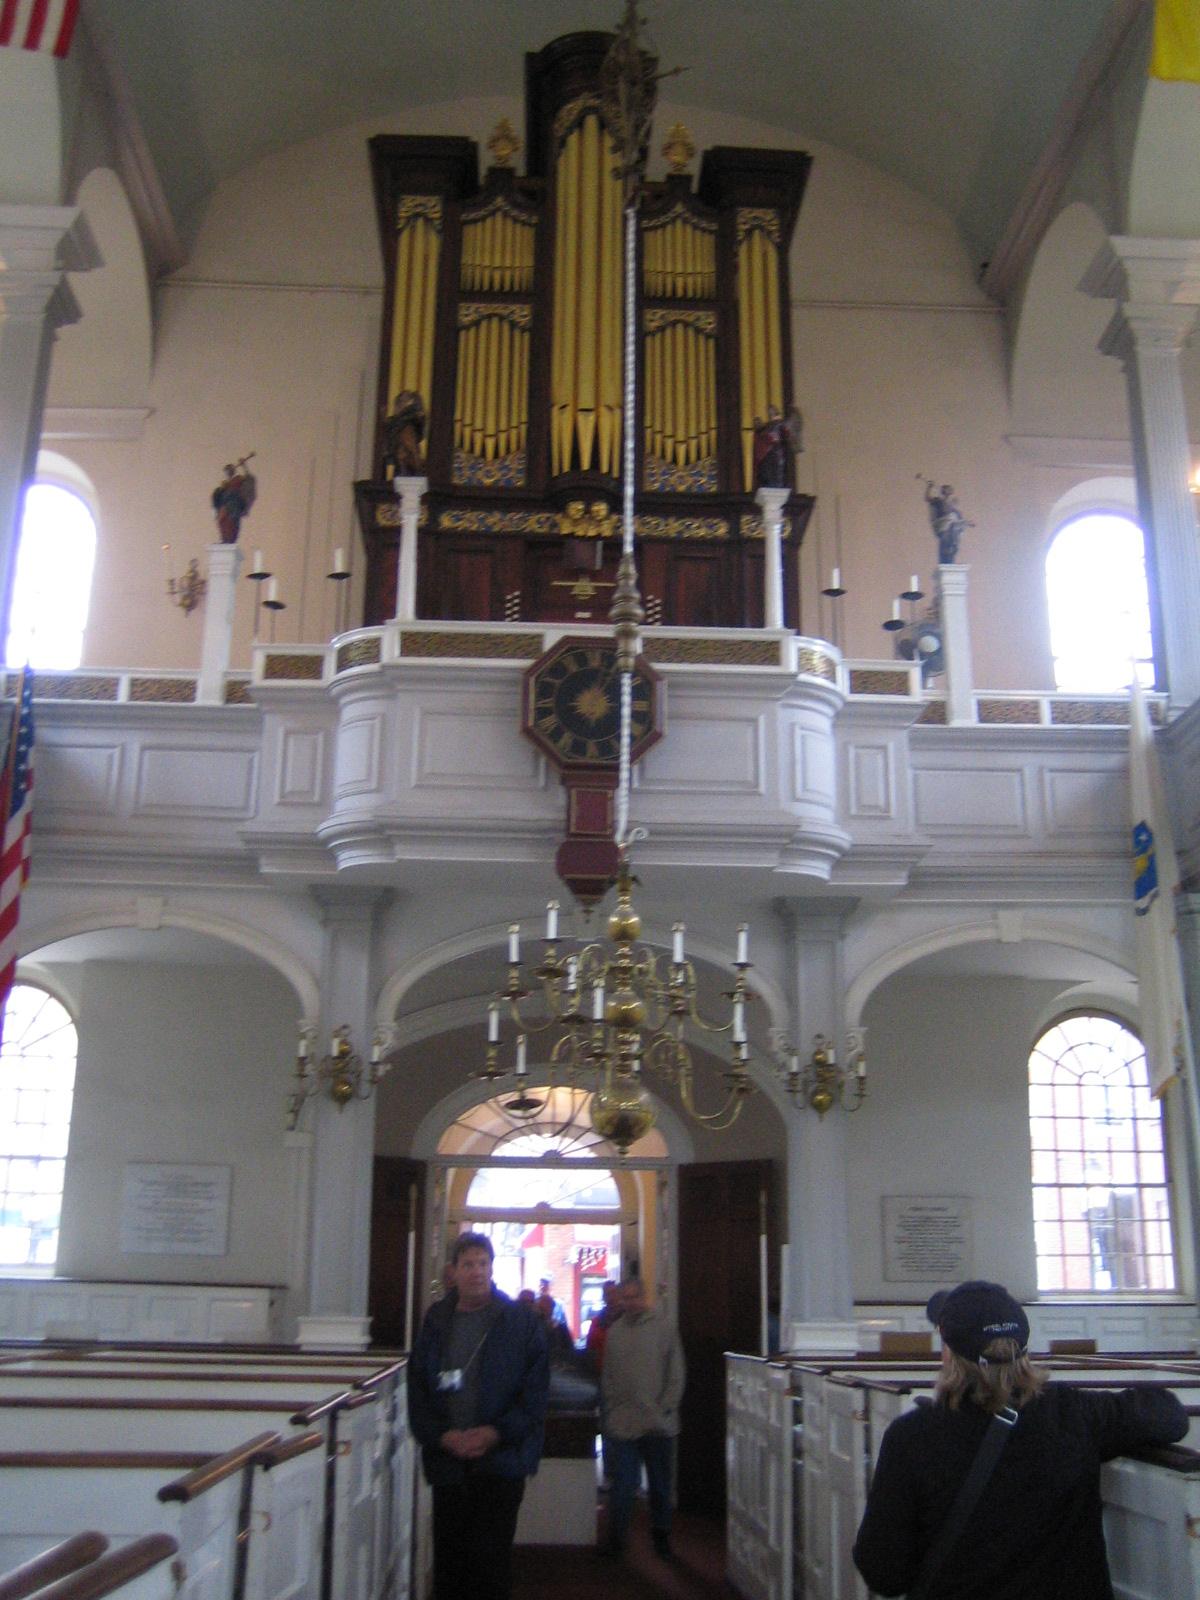 Boston - Organ Pipes in Old North Church